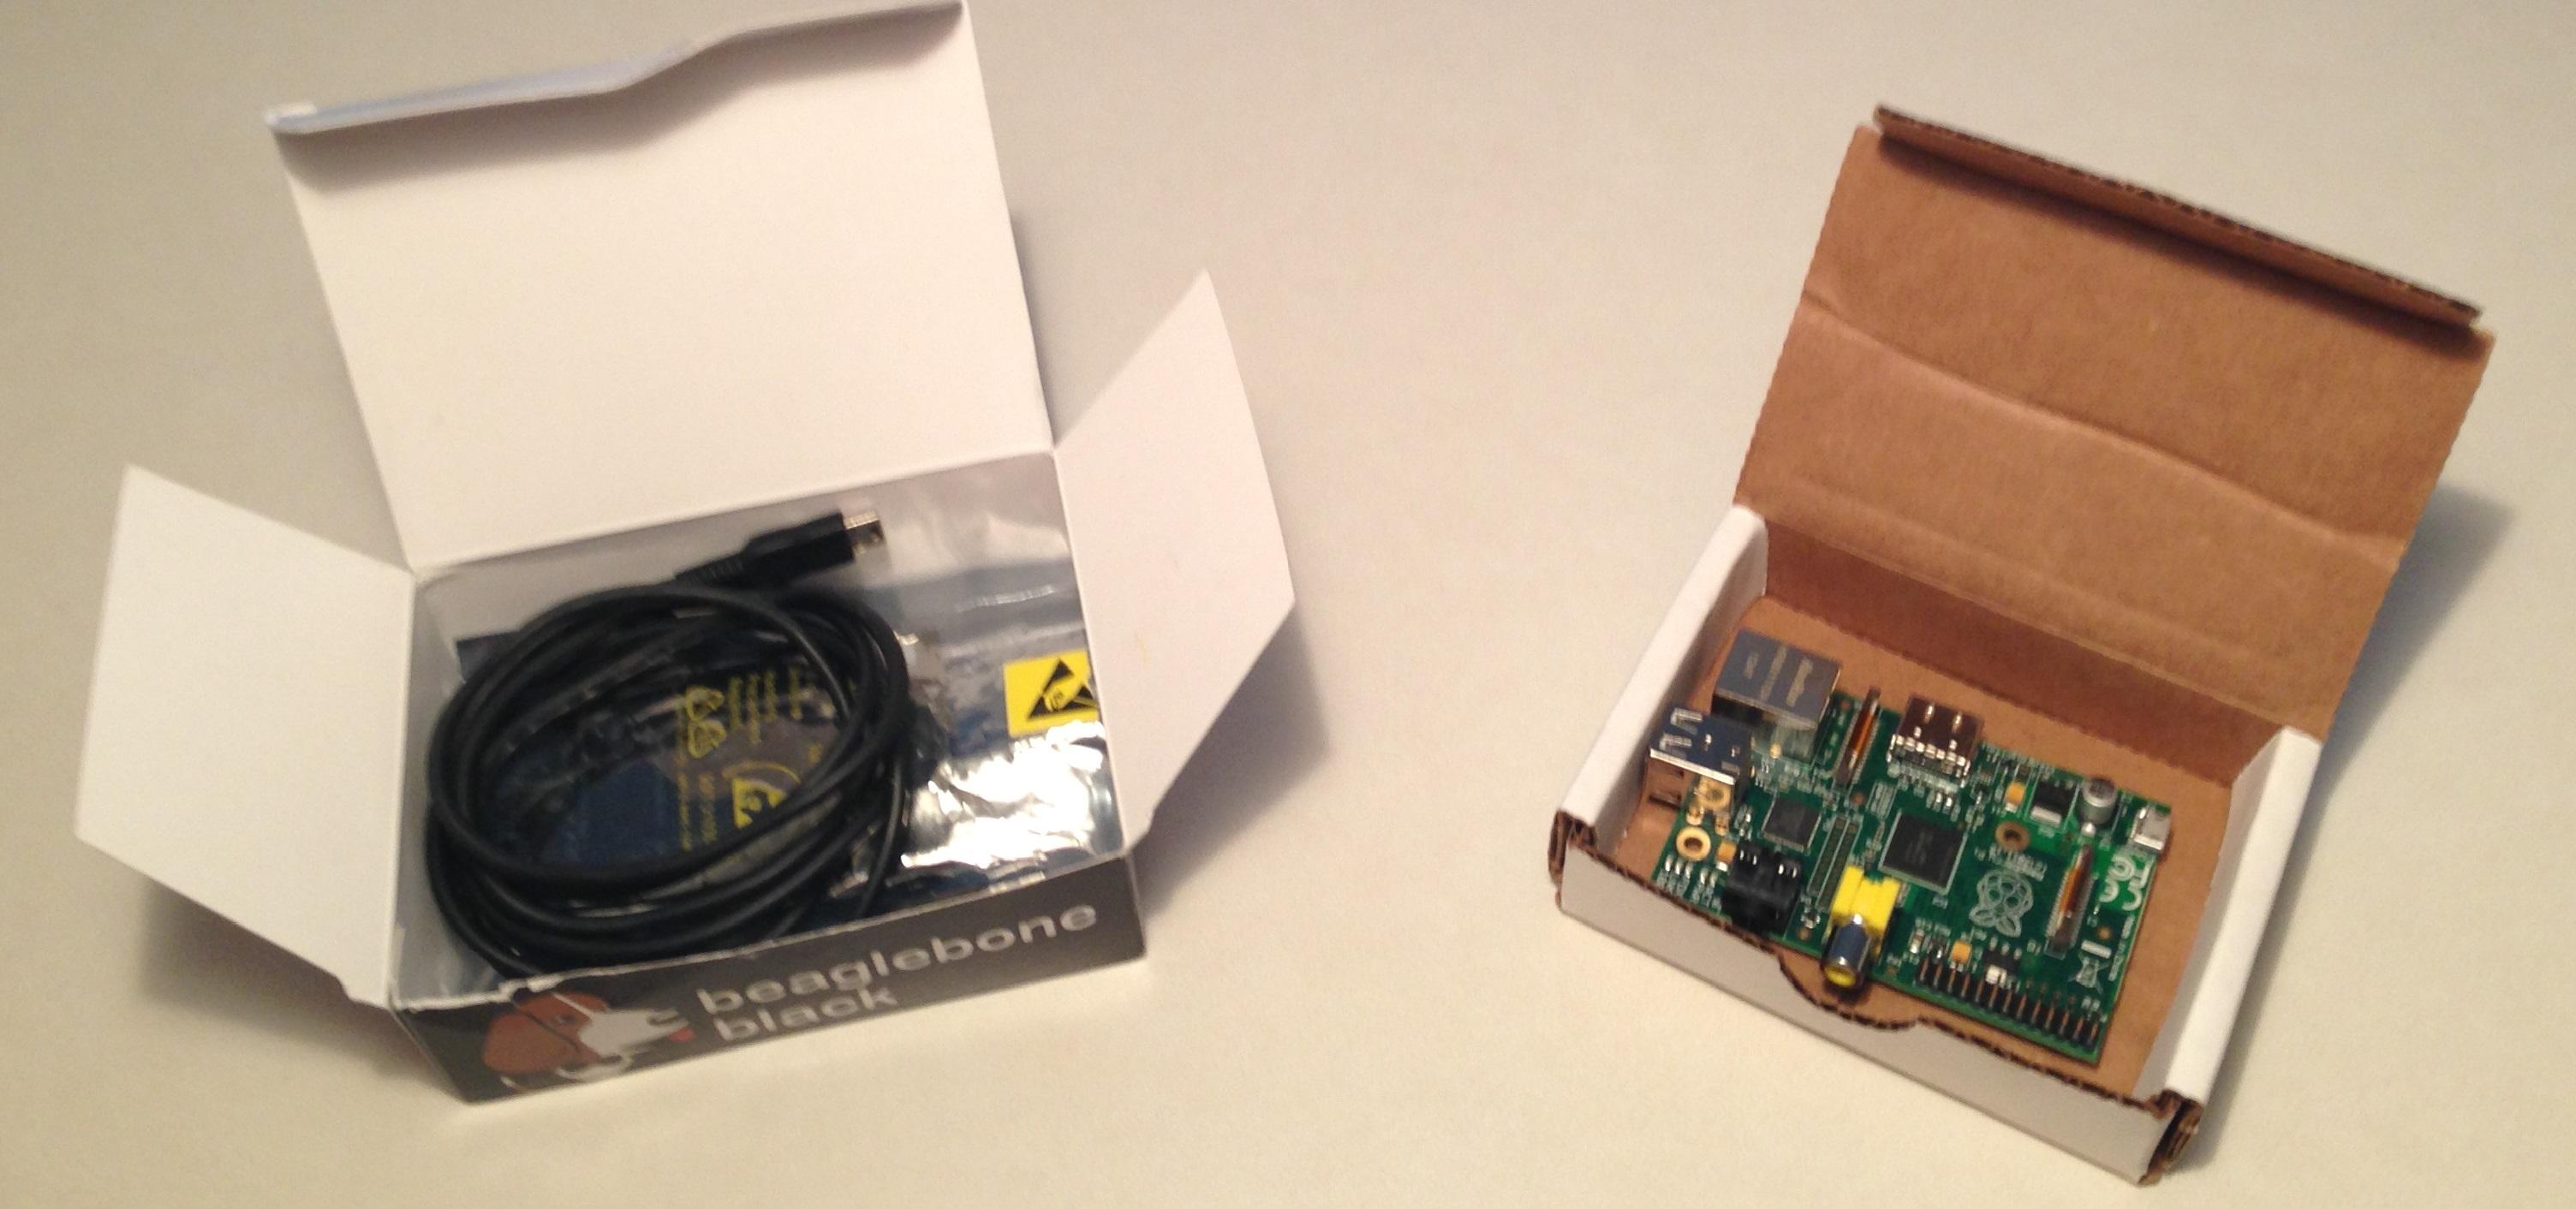 How to Choose the Right Platform: Raspberry Pi or BeagleBone Black?